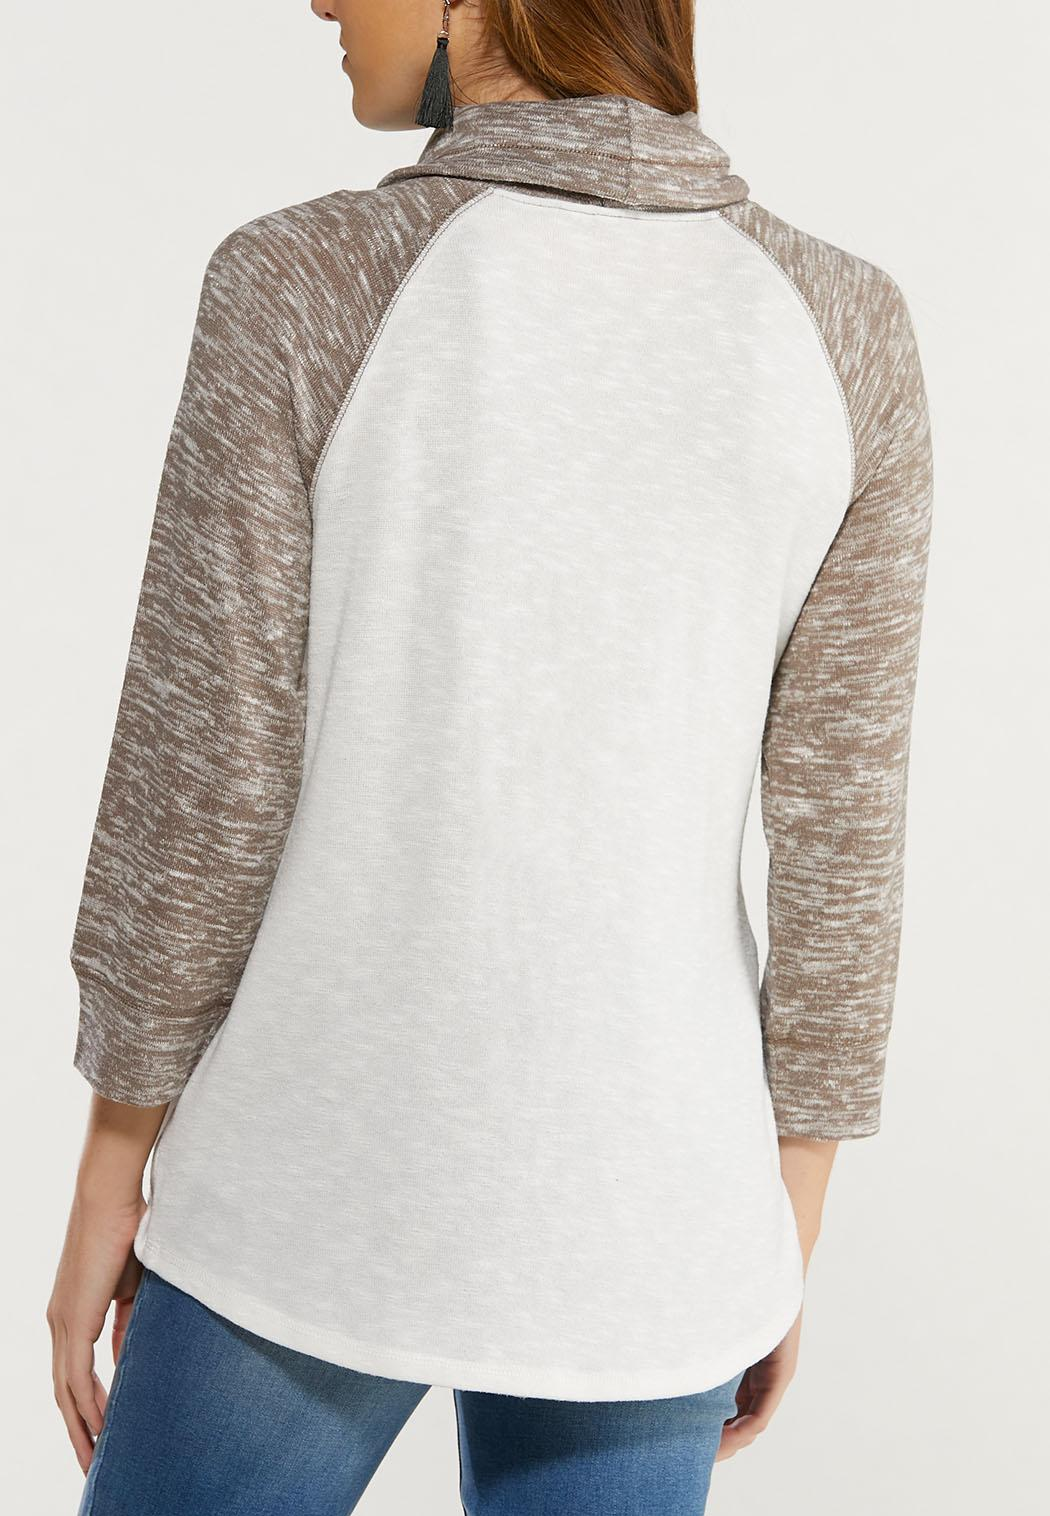 Plus Size Inspirational Cowl Neck Top (Item #44501707)